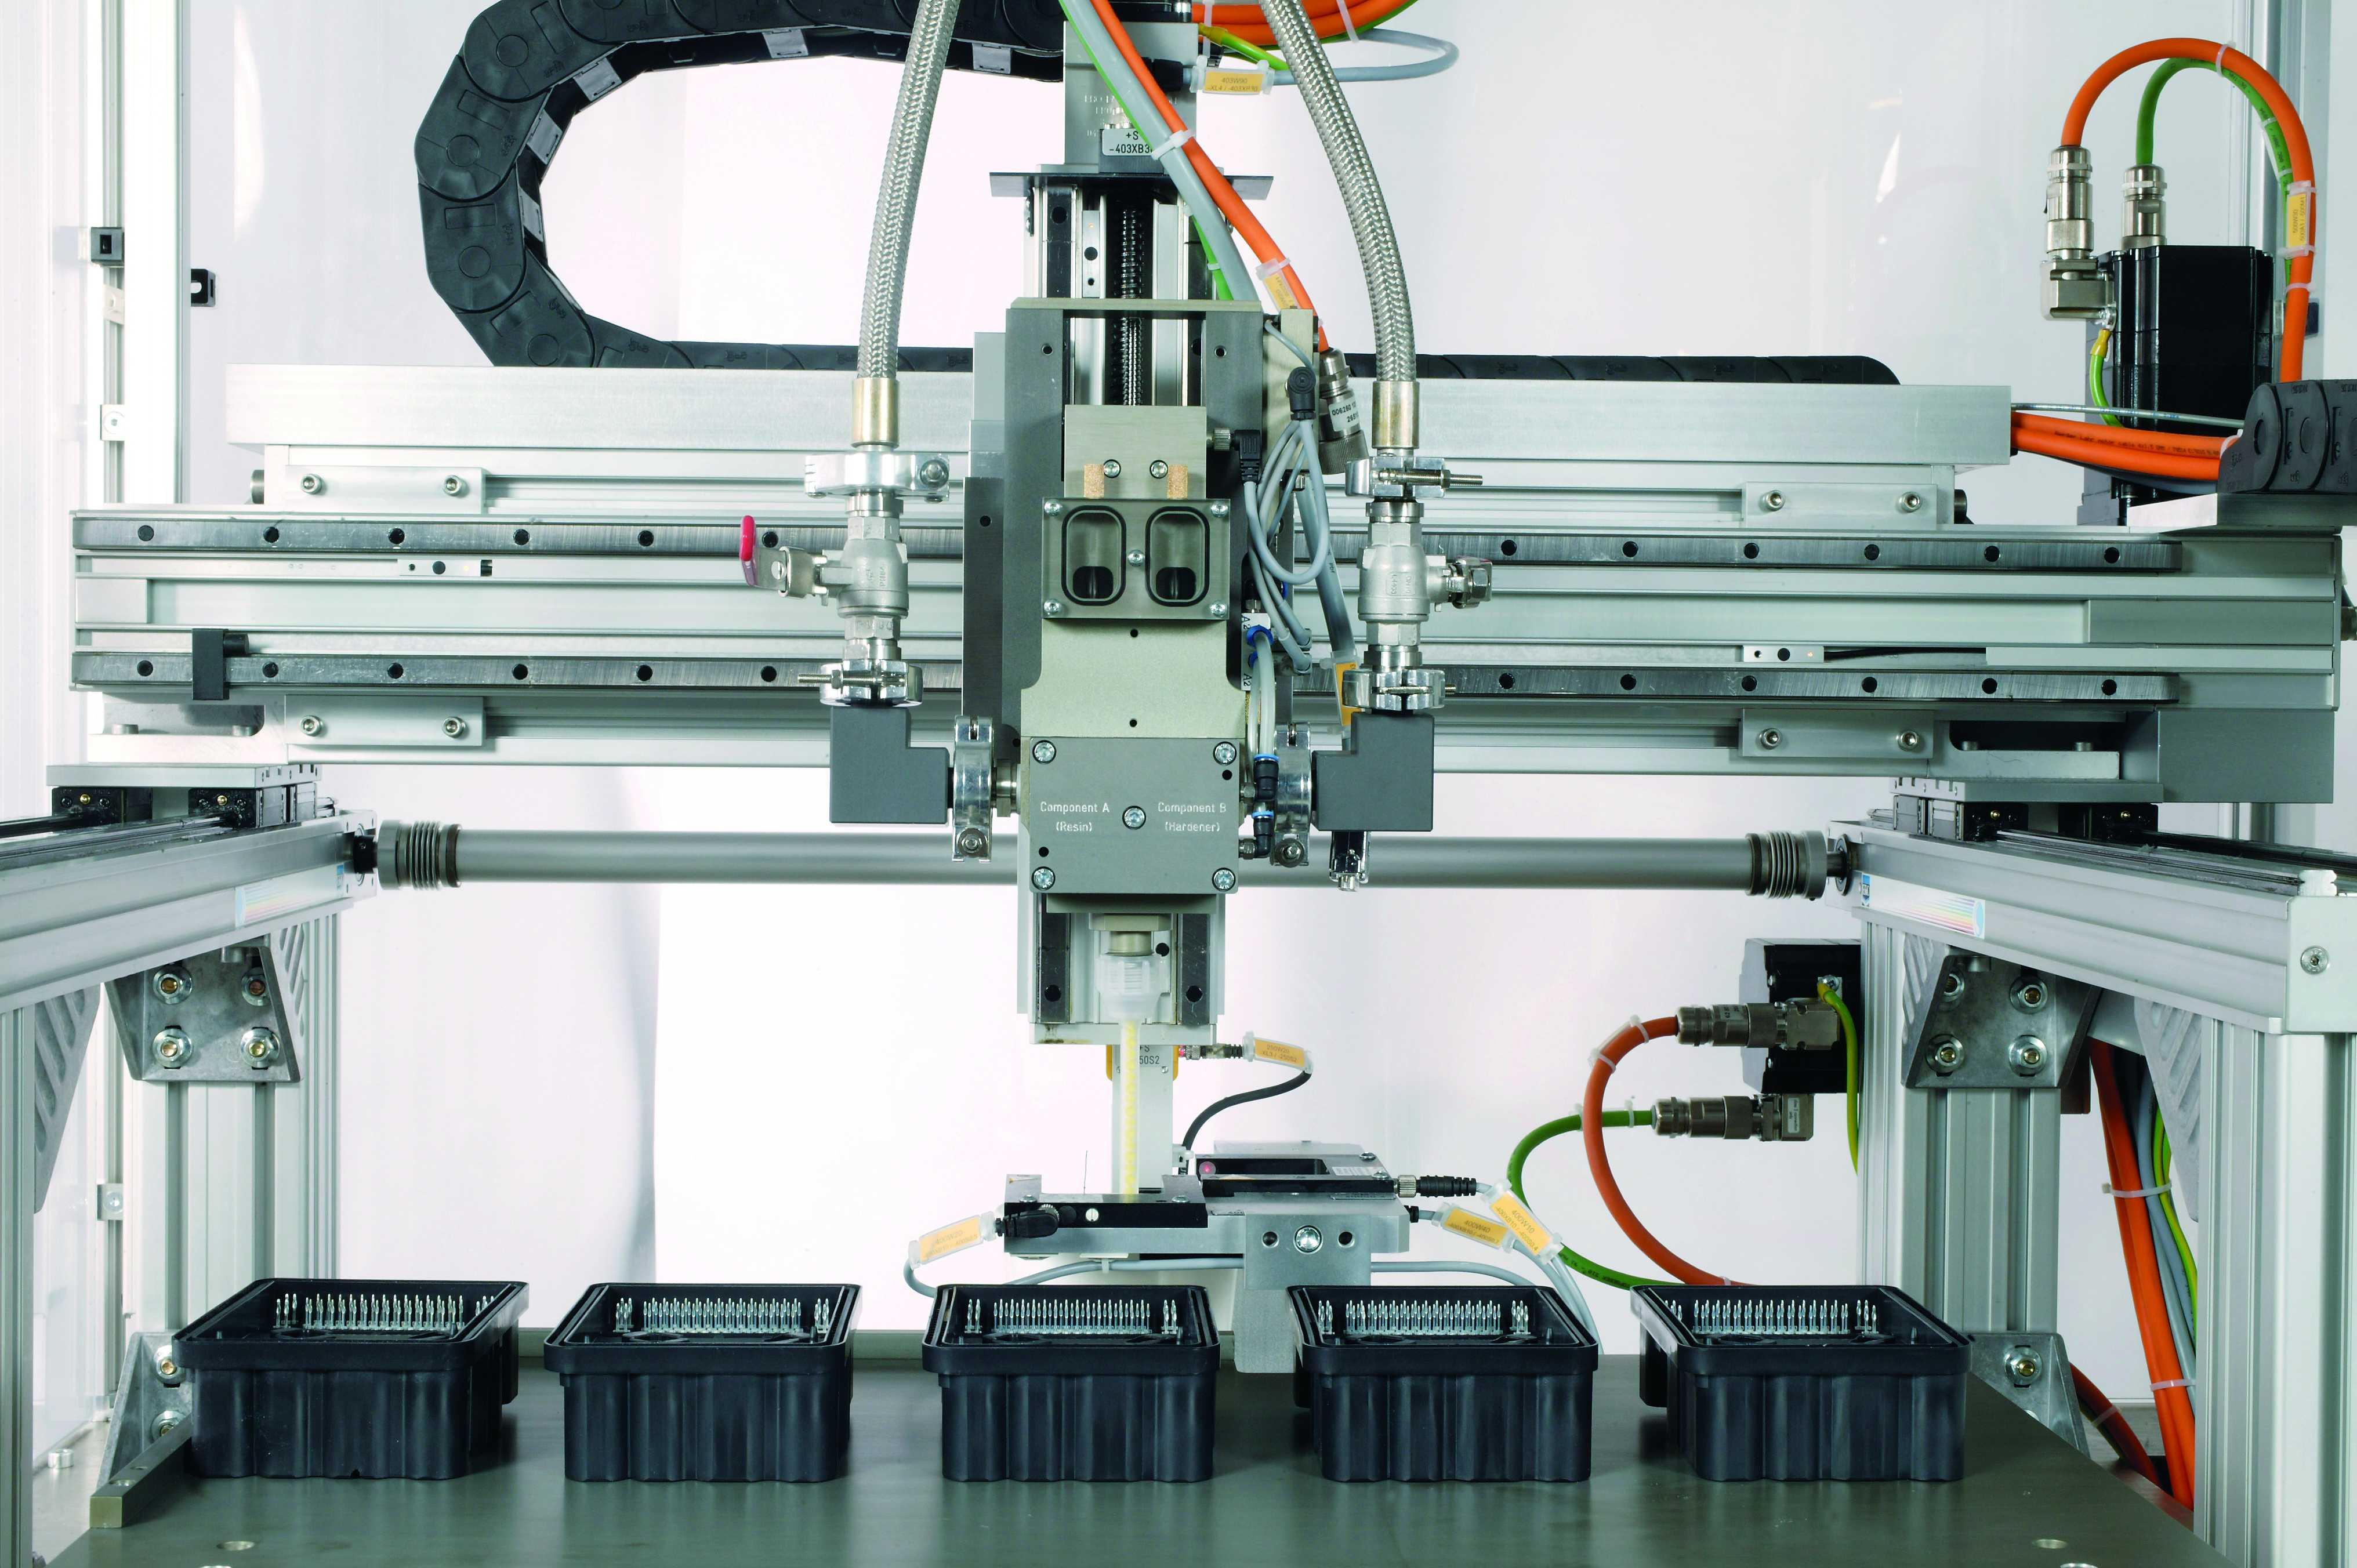 Portalroboter mit Linearführungen